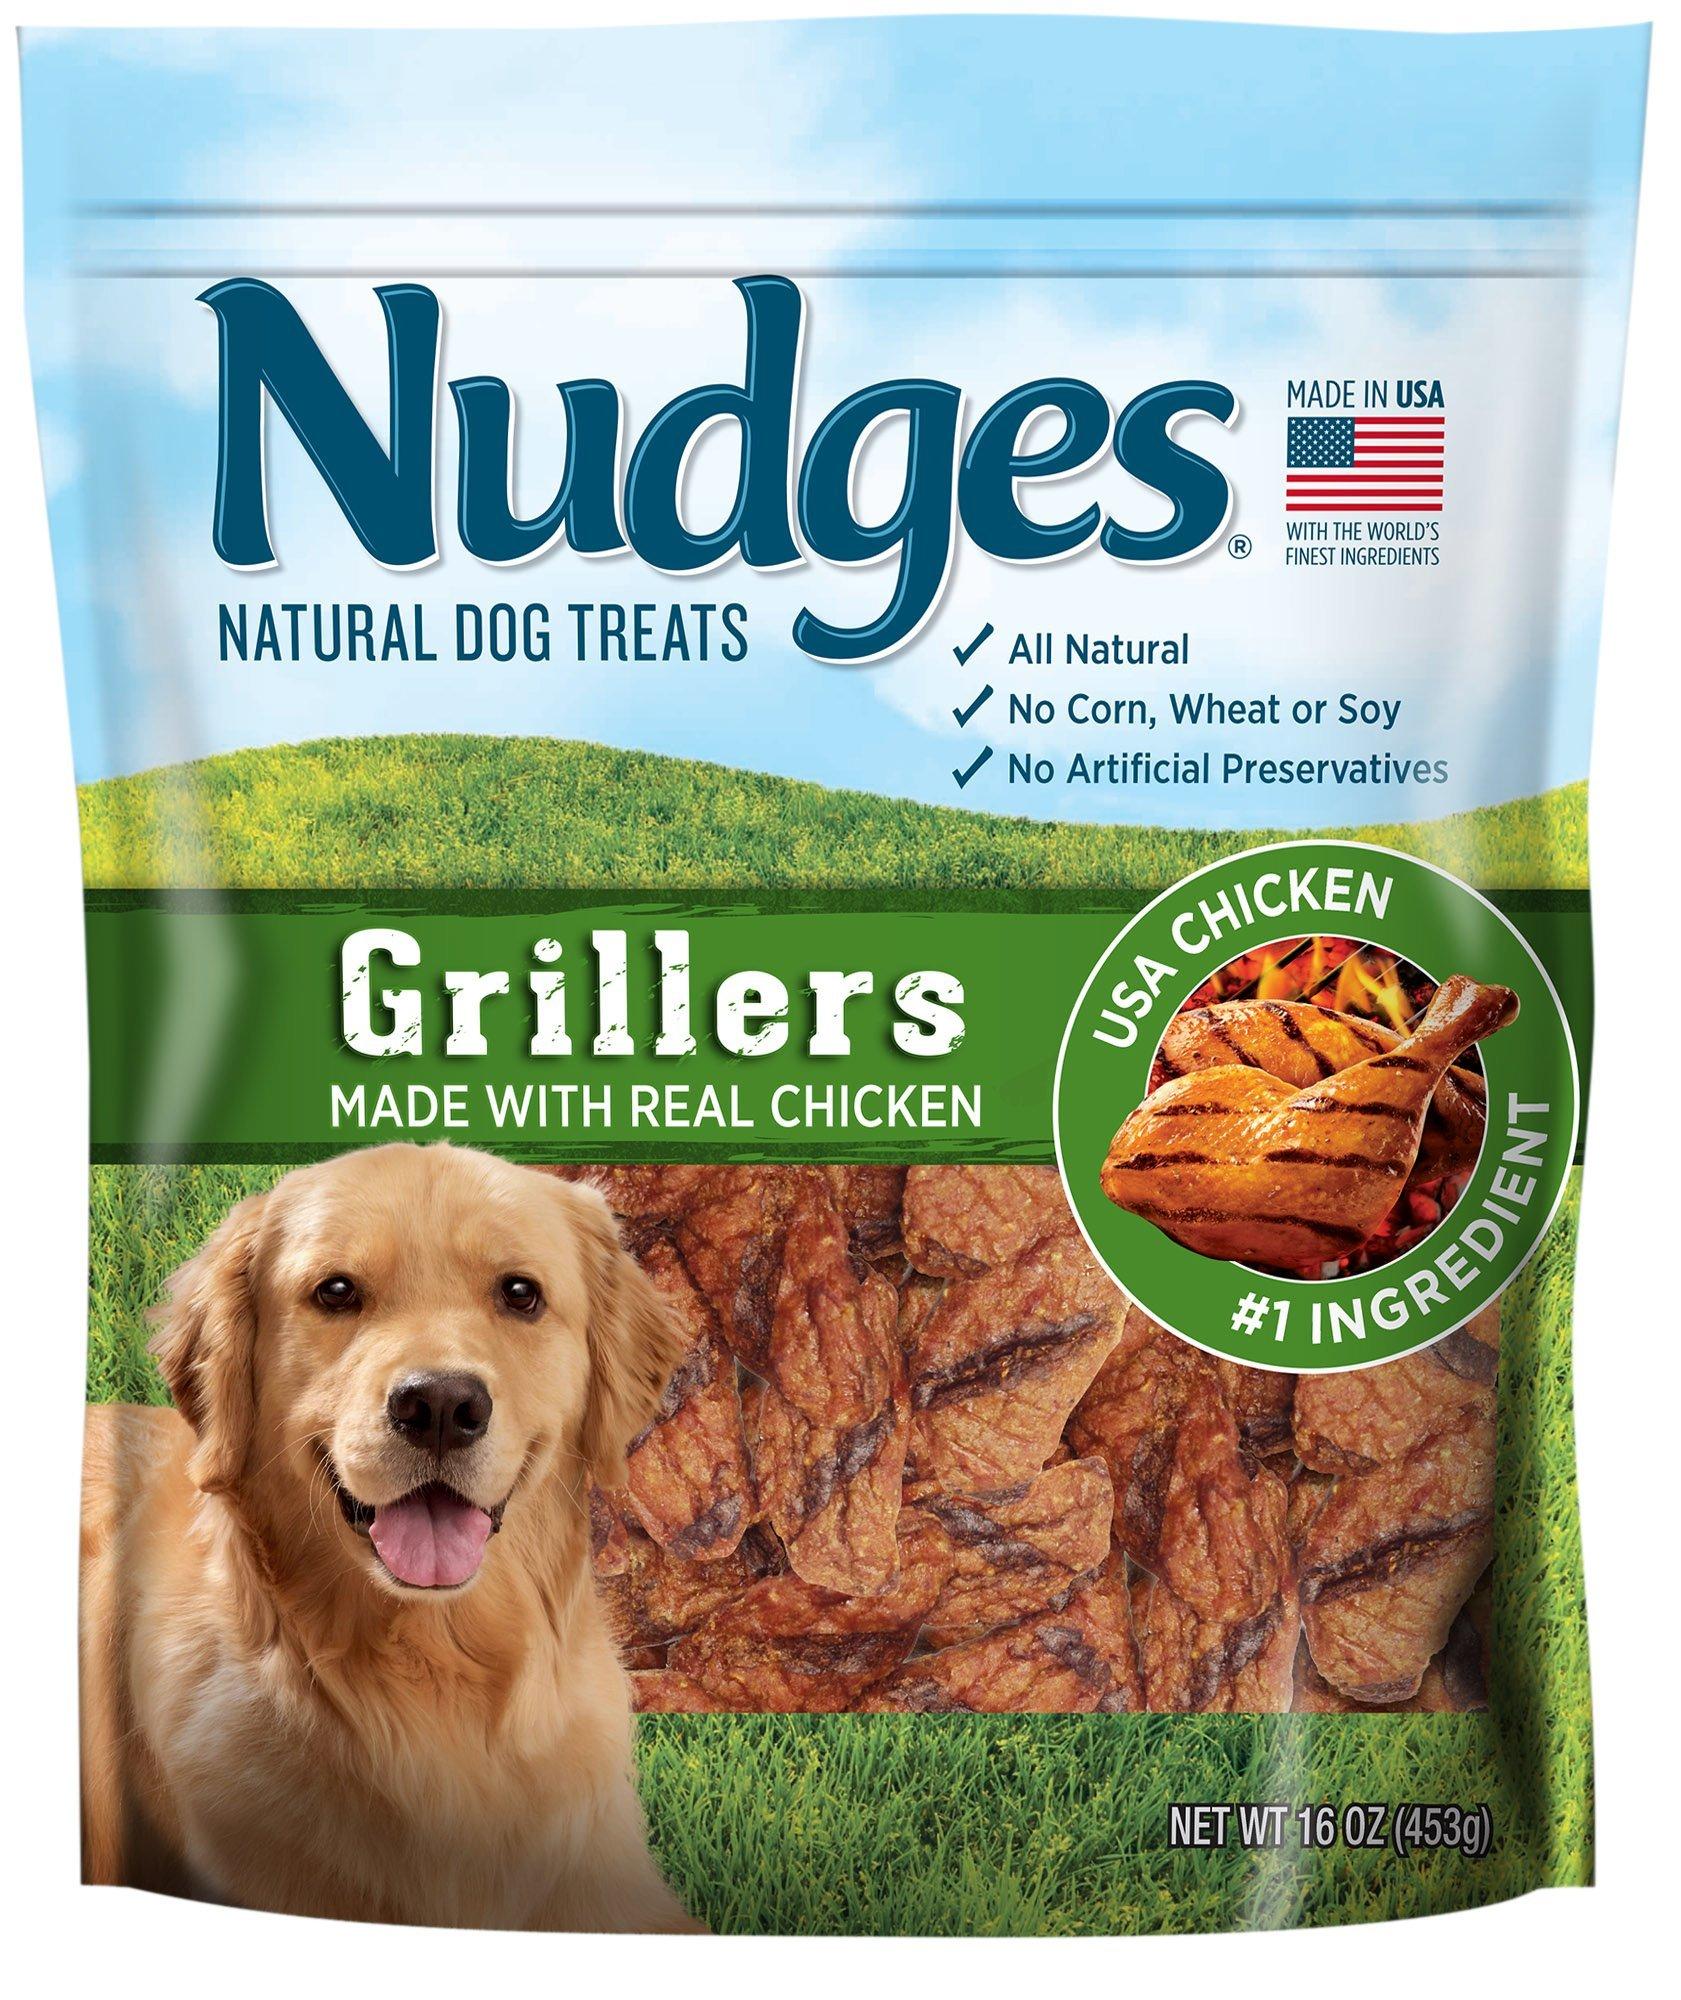 Nudges Chicken Grillers Dog Treats, 18 oz